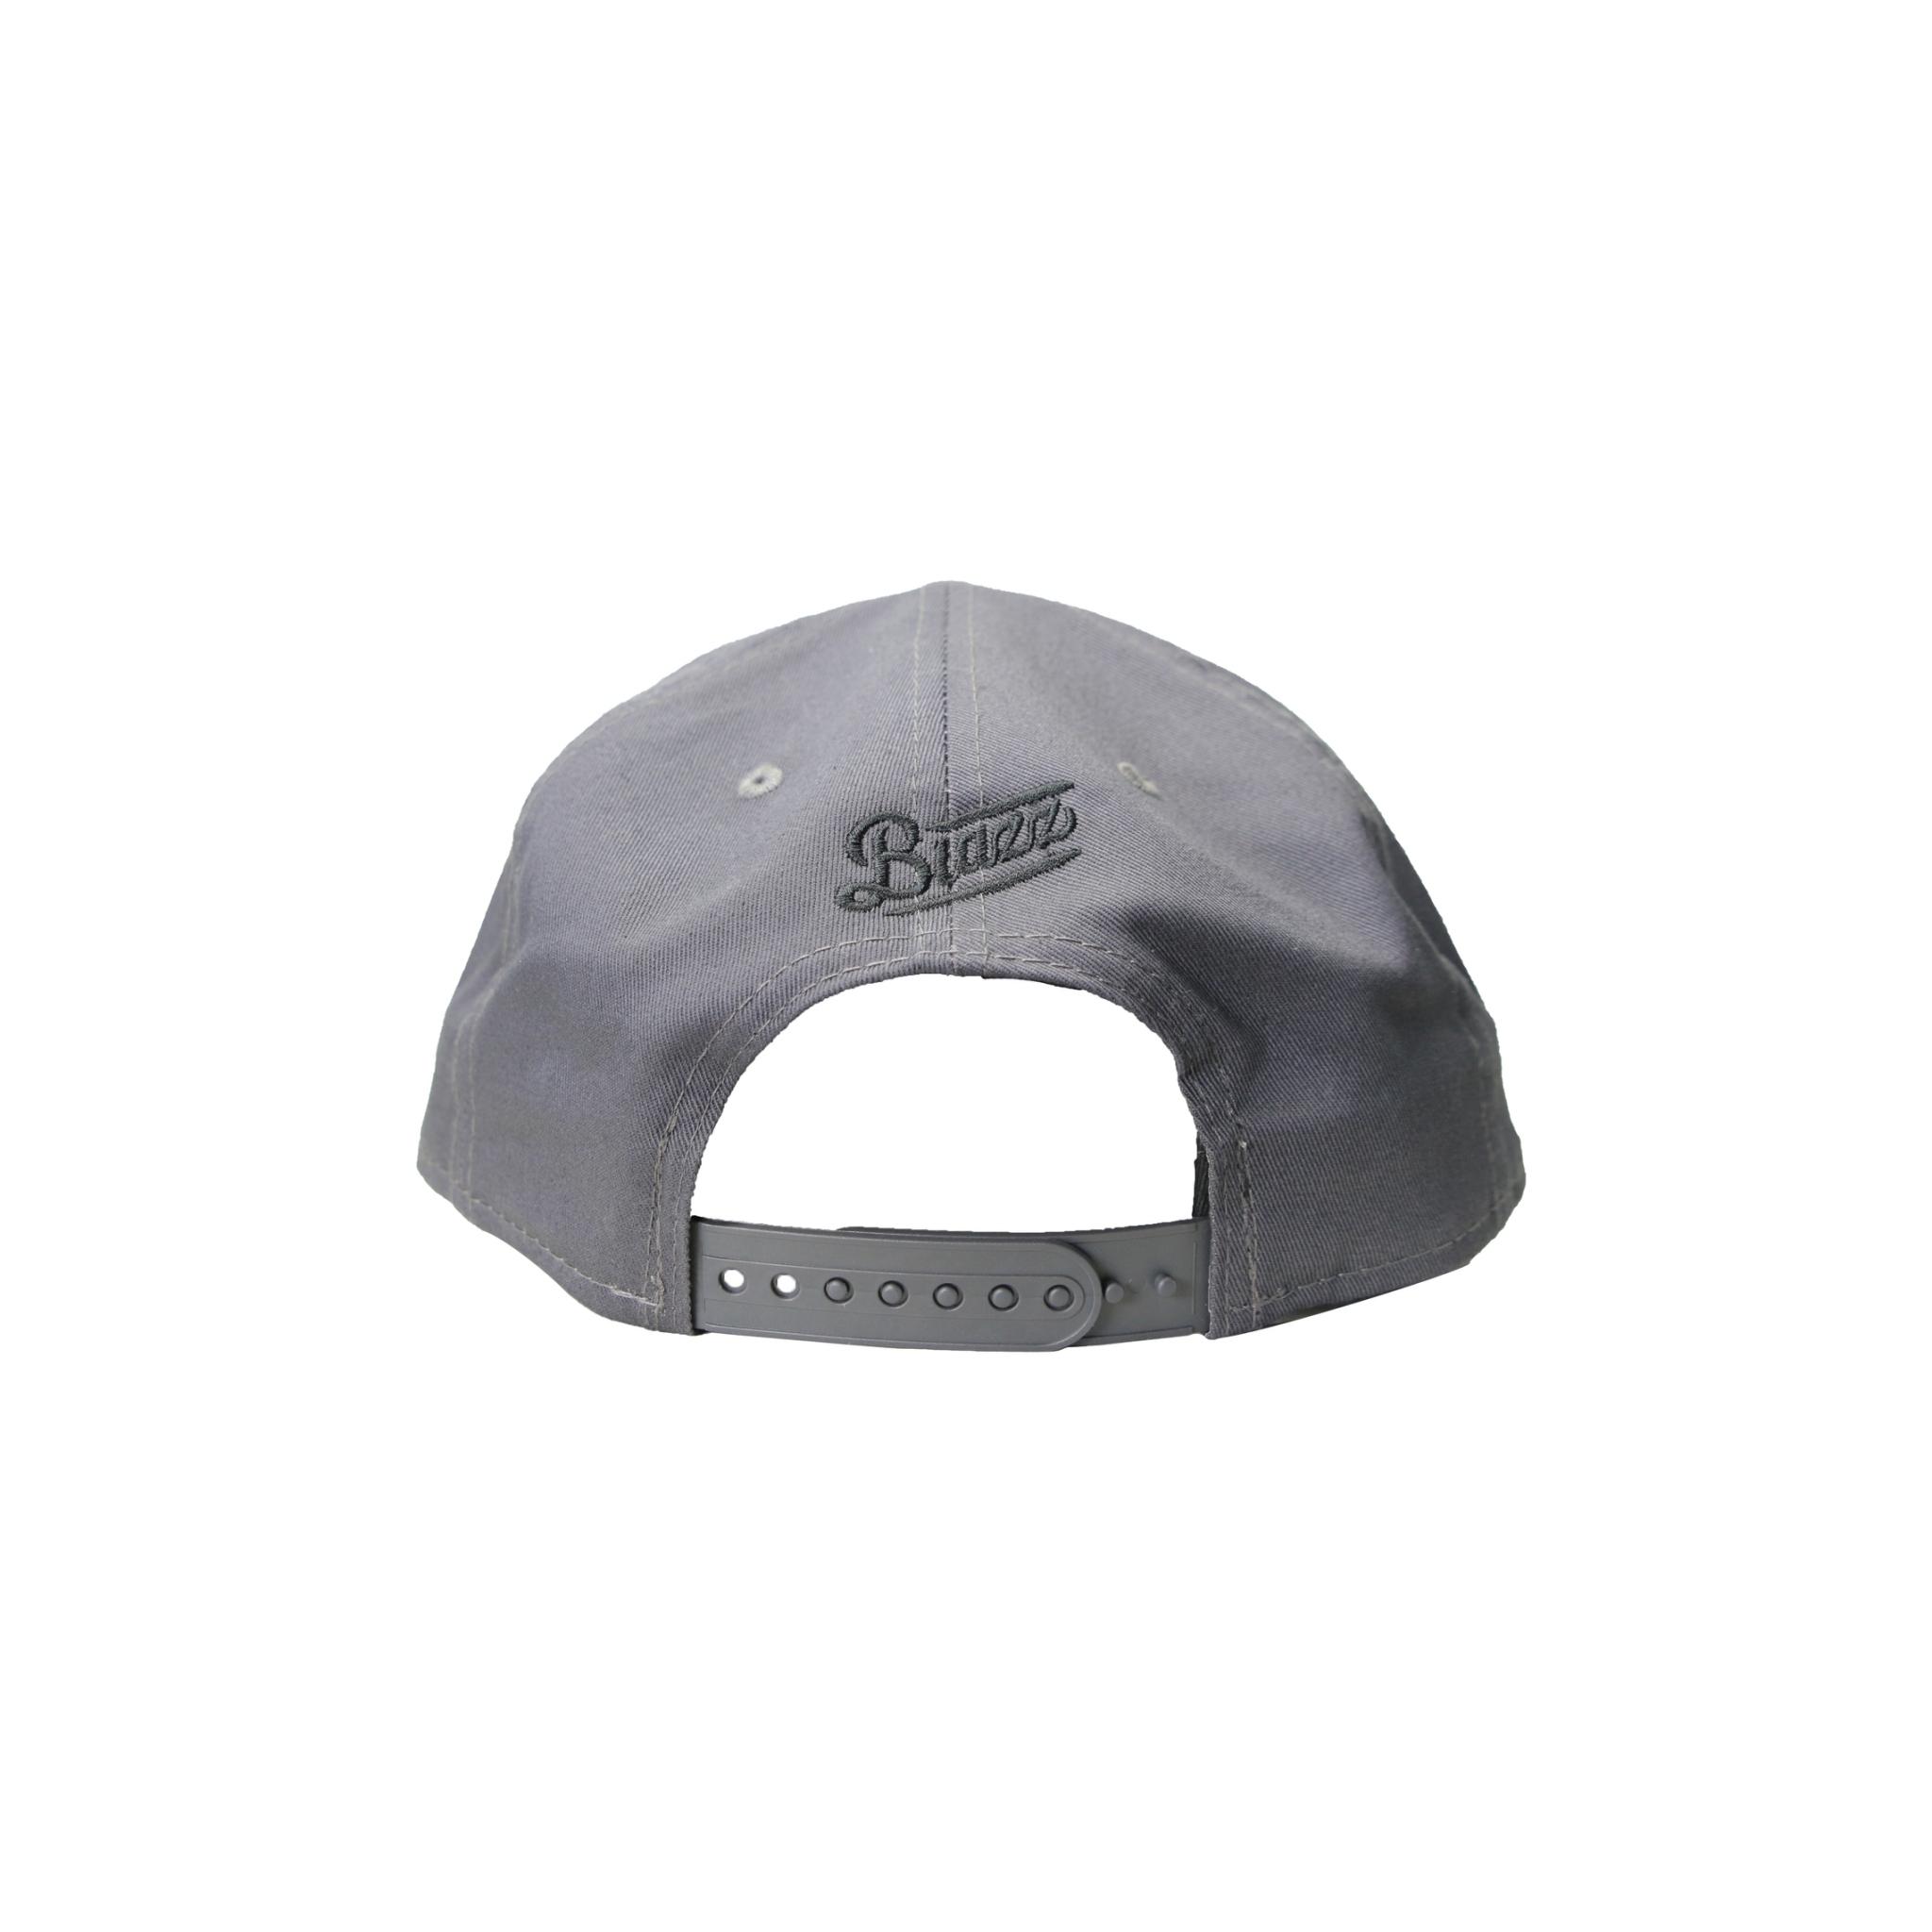 KB NEWERA 9FIFTY SNAPBACK CAP [GRAY]